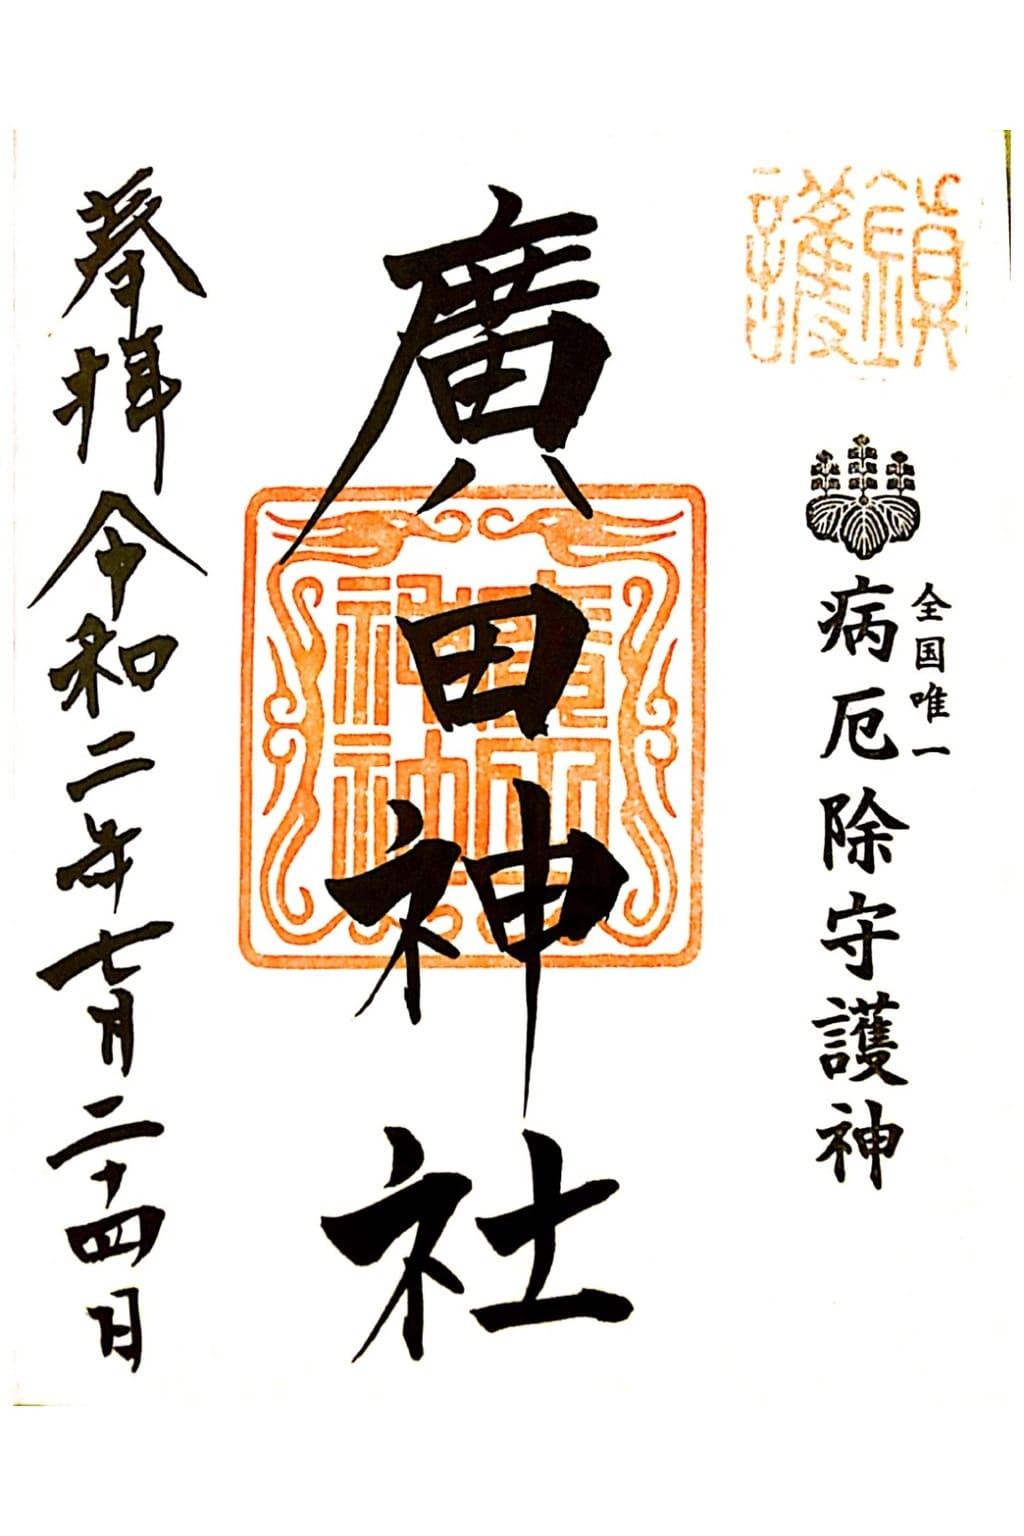 廣田神社~病厄除守護神~の御朱印